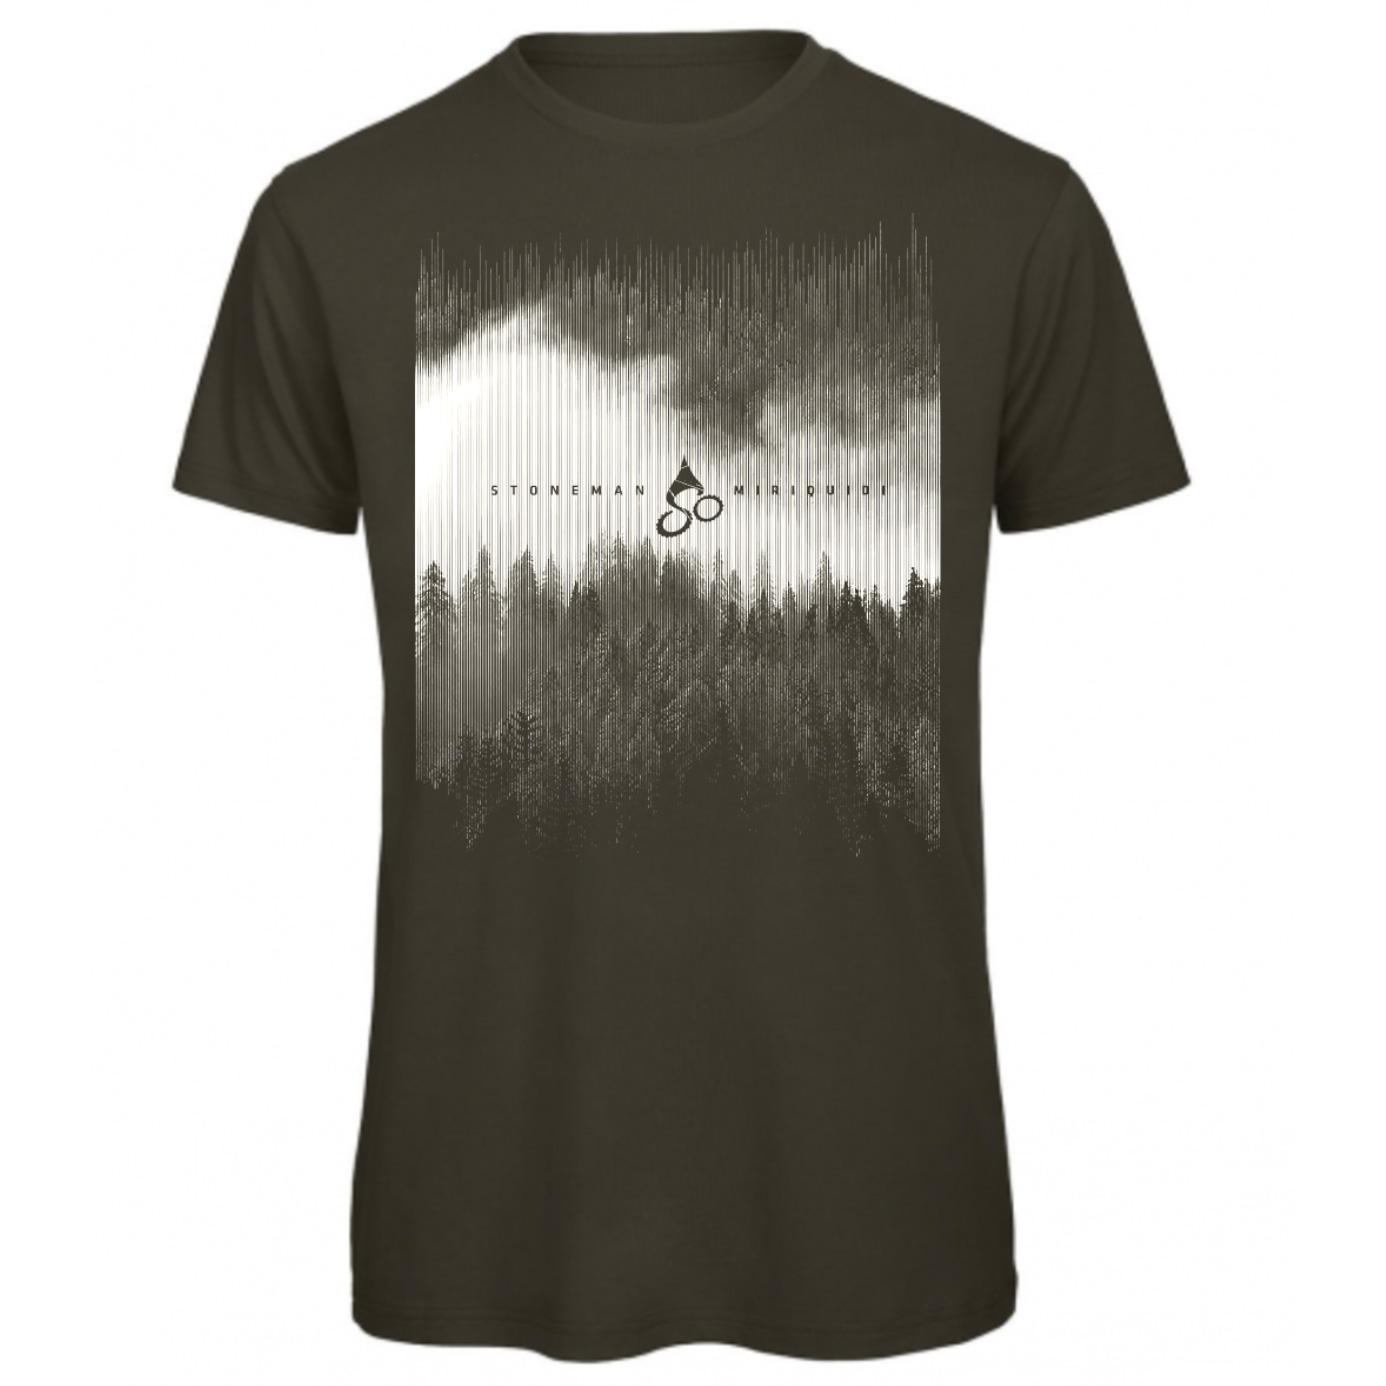 Stoneman Miriquidi »Dunkelwald« Männer T-Shirt - olive